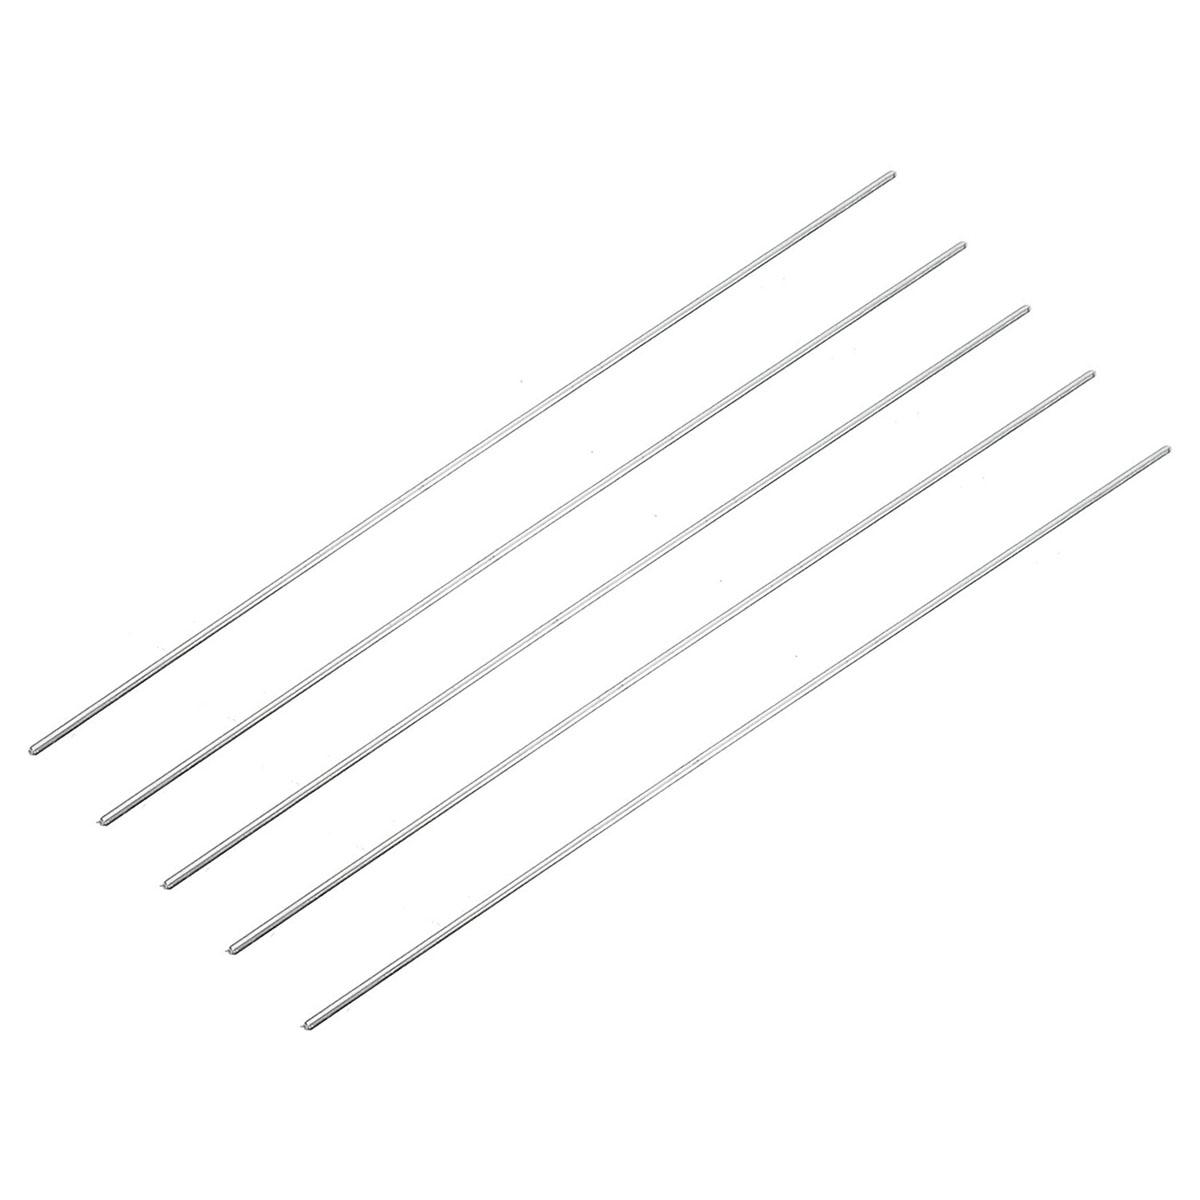 5pcs 230x2mm Low Temp Aluminum Repair Rods For Aluminum Gas Argon Arc Welding Sale